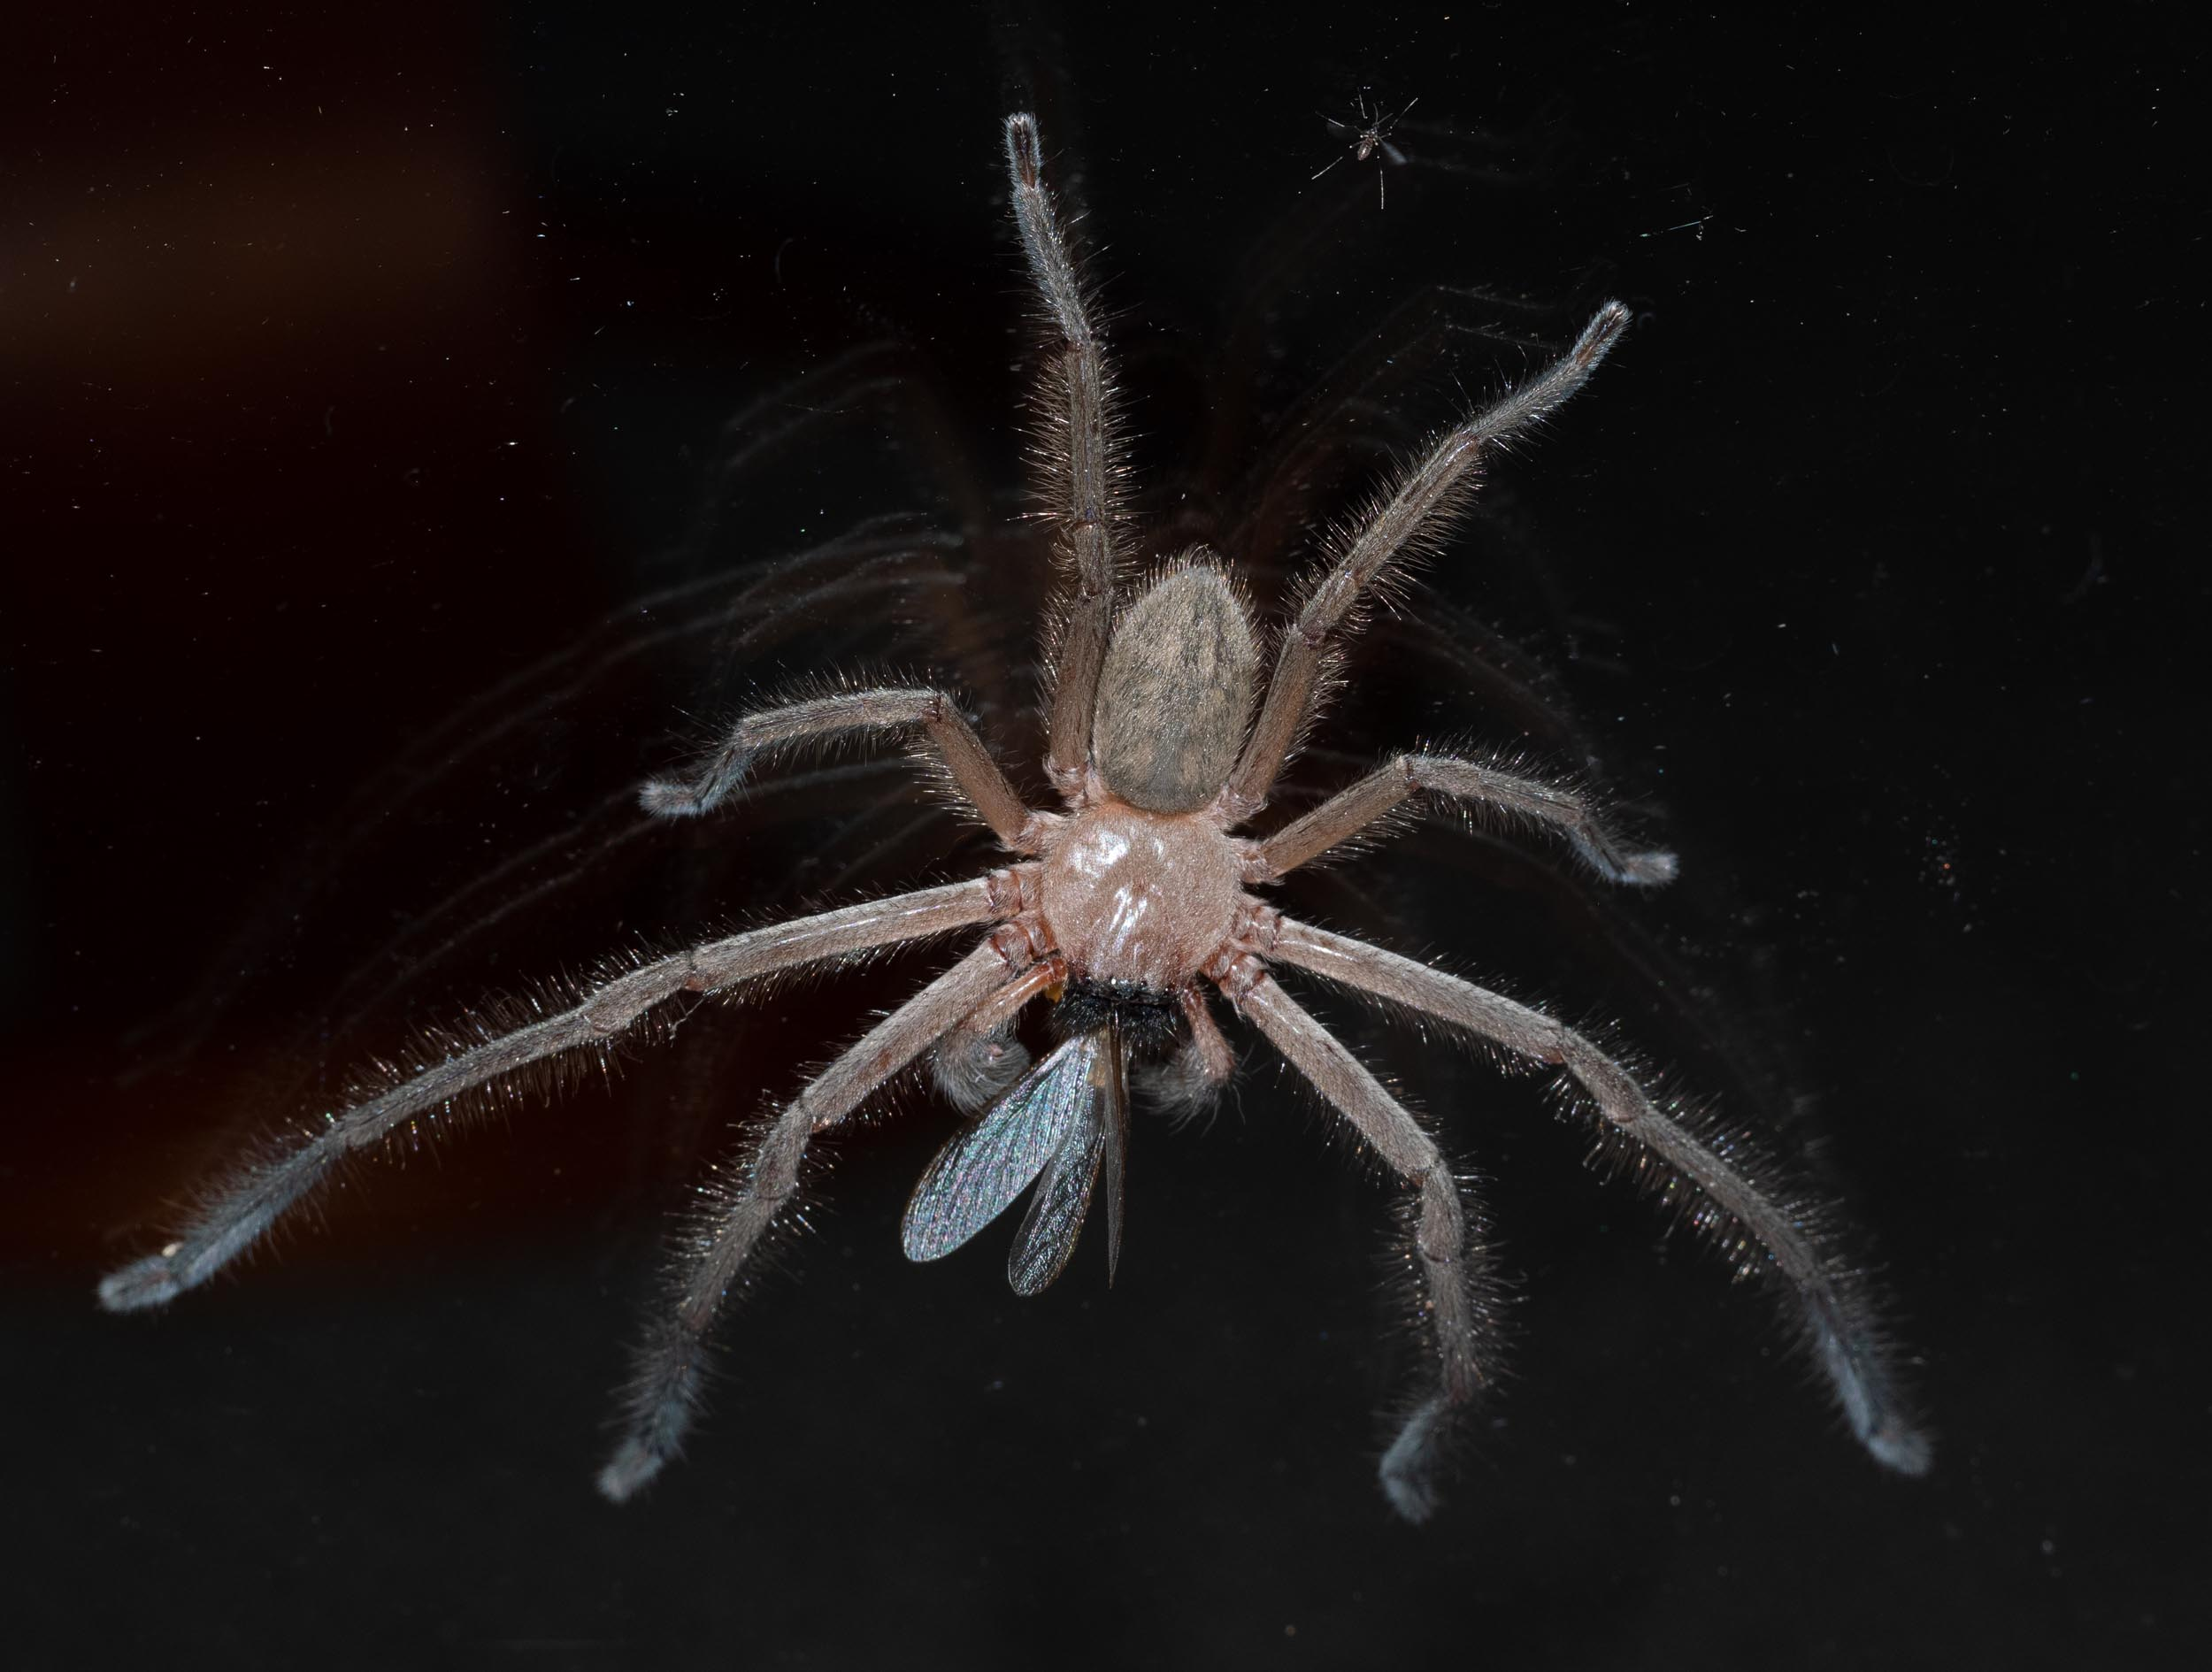 Social Huntsman spider